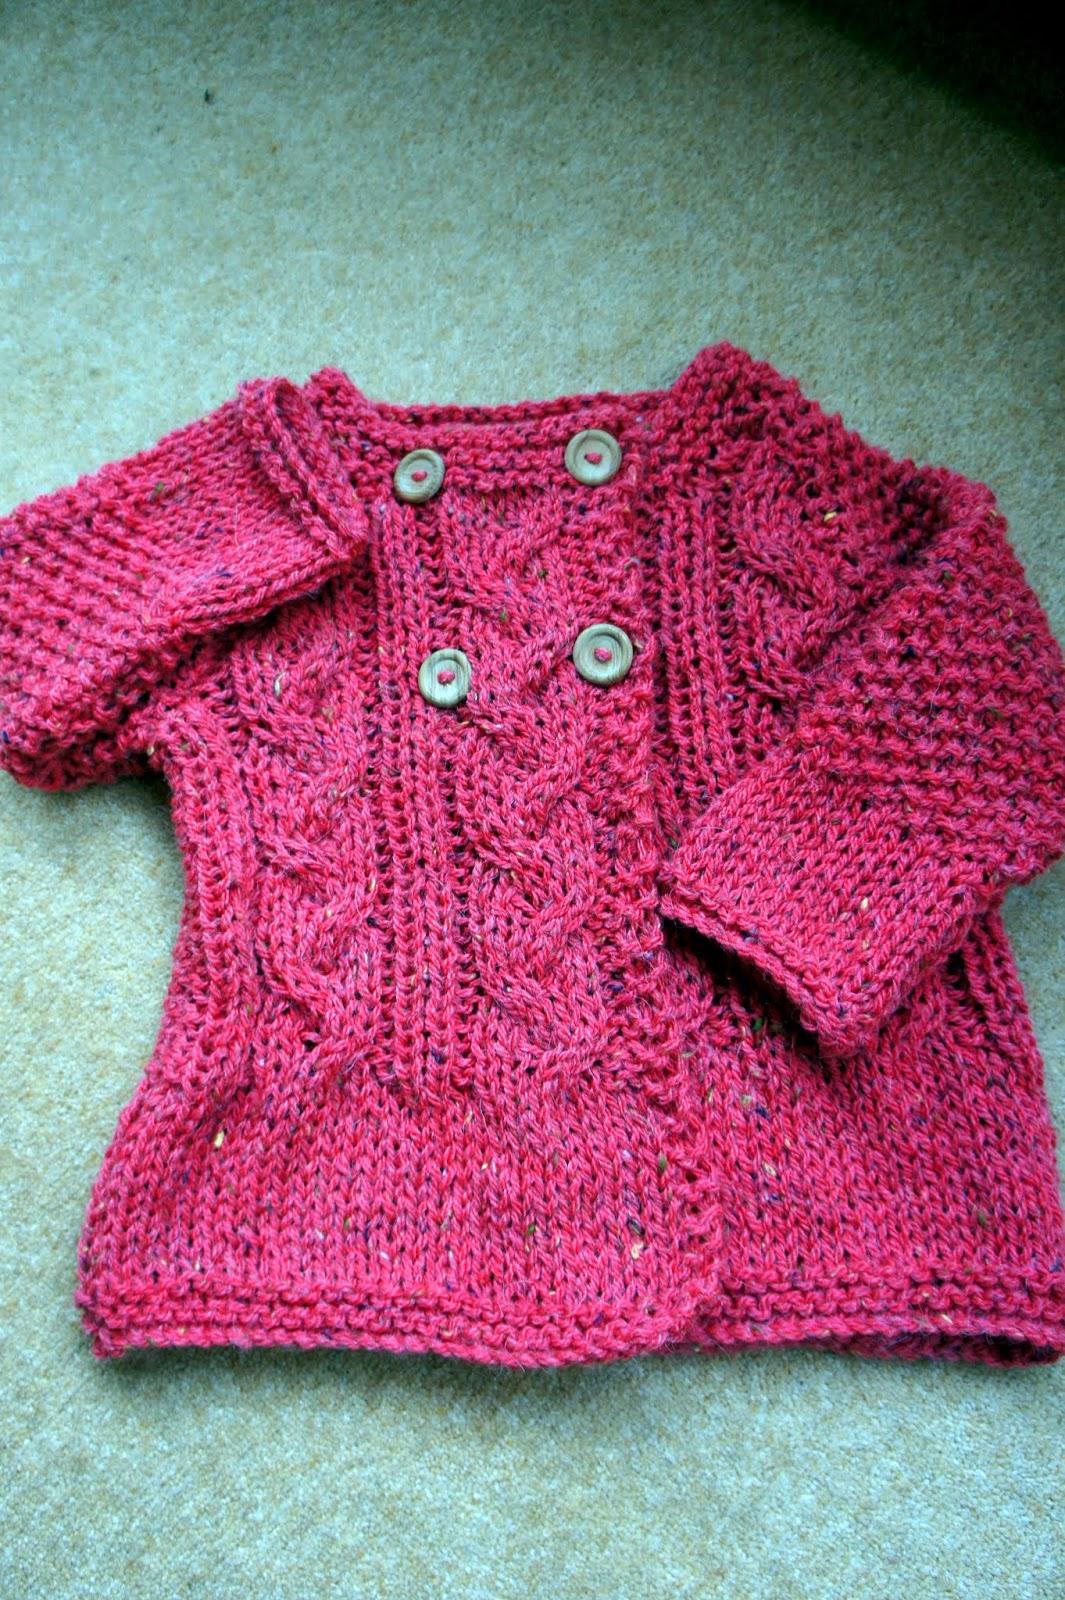 GRANNYS WORLD: Knitting - love a quick knit!